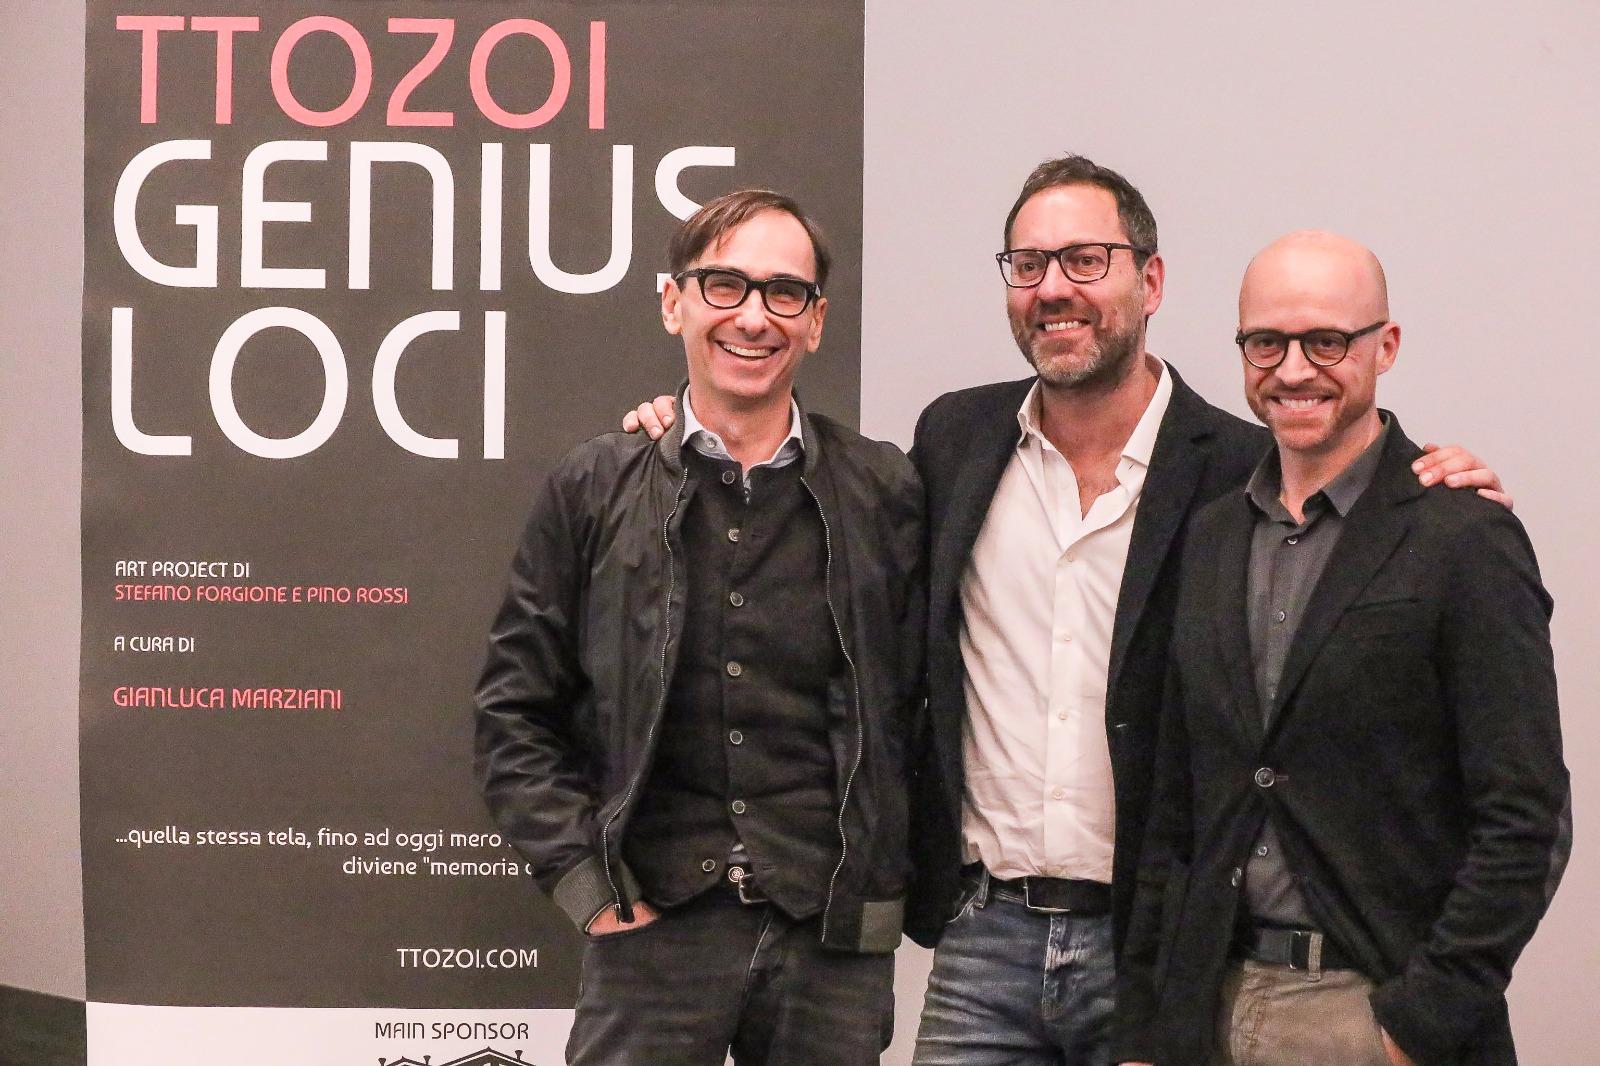 Gianluca Marziani e TTOZOI